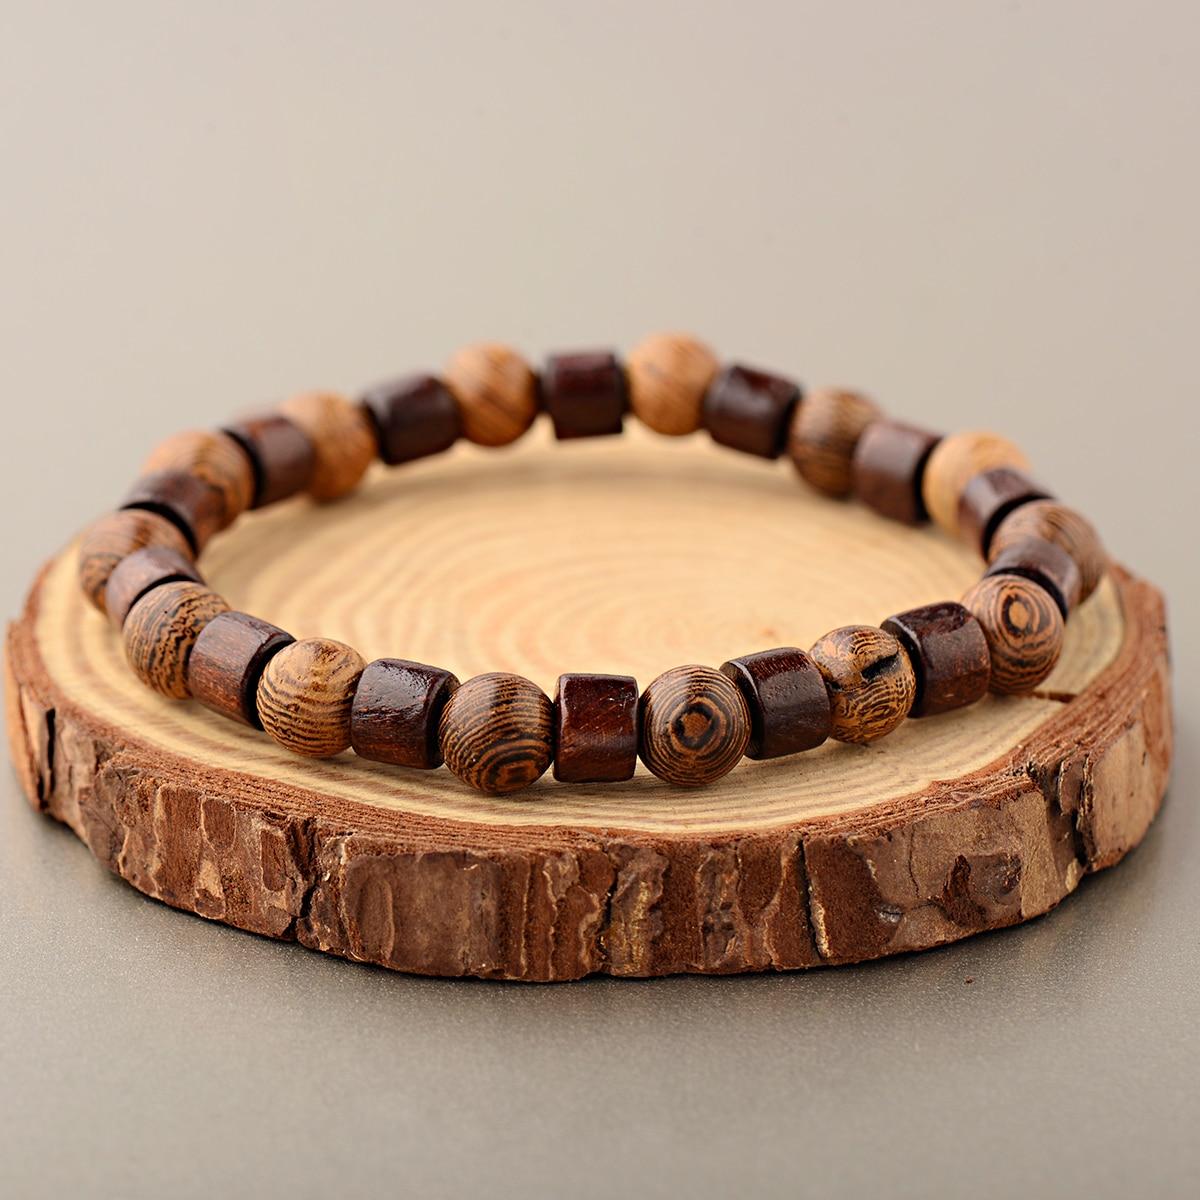 OIQUEI 8mm Natural Round Cylinder Wood Beads Bracelet Men Classic Elastic Buddhist Prayer Buddha Hommes bileklik bijoux